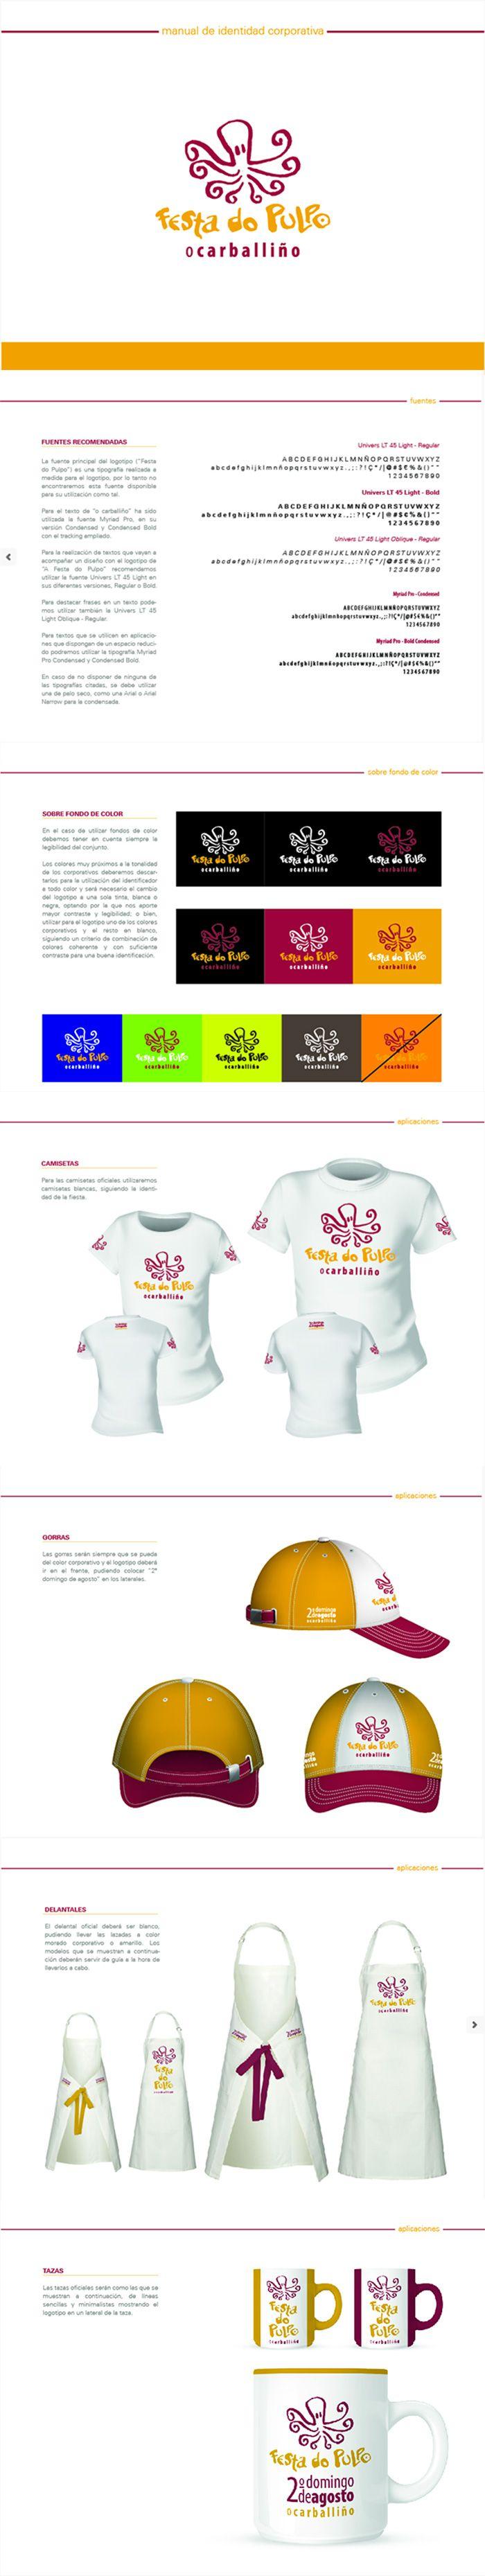 Manual de identidad Corporativa para Festa do Pulpo do Carballiño